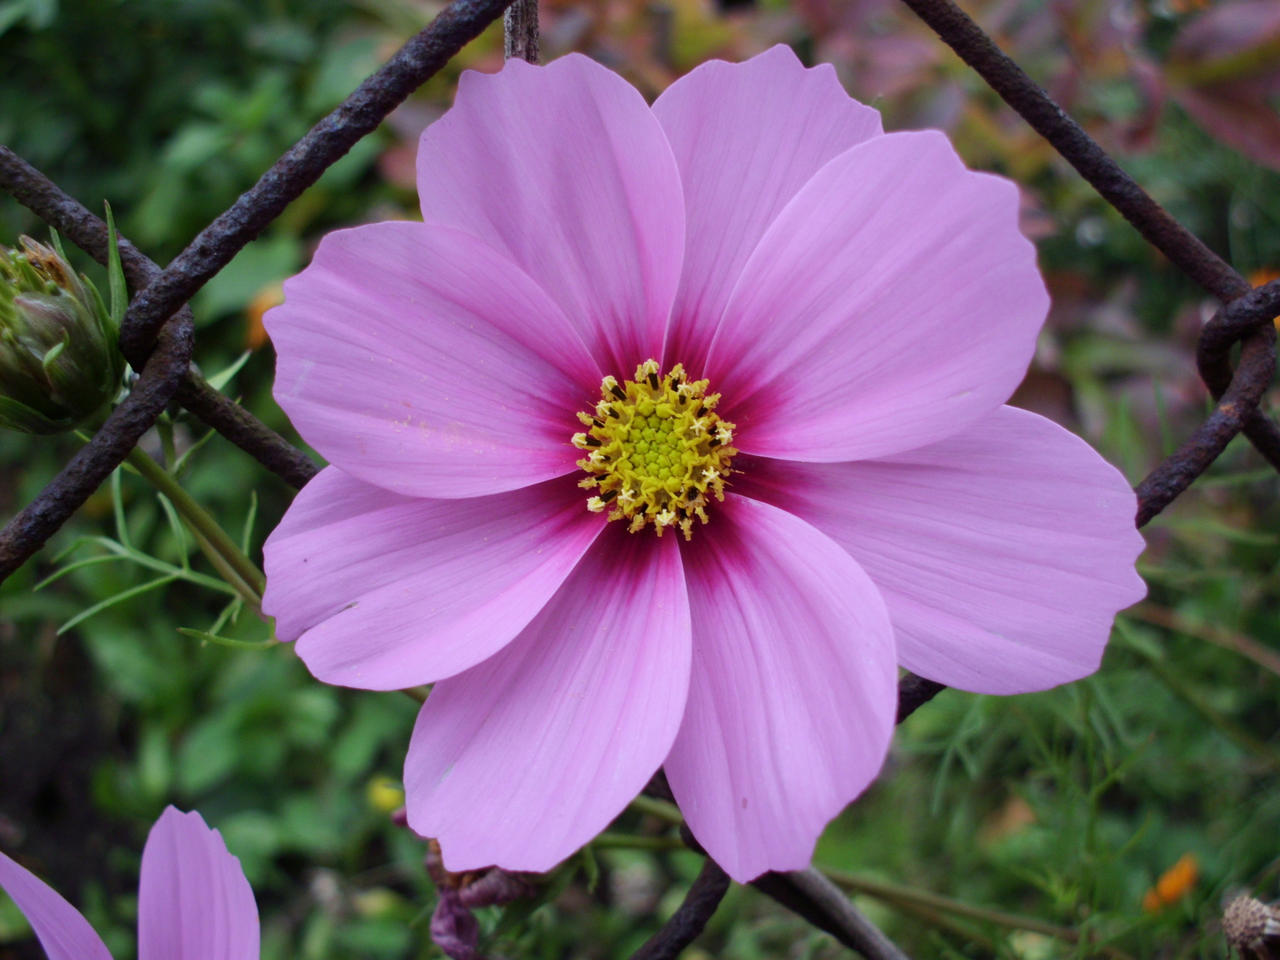 Blossom 06 by wuestenbrand